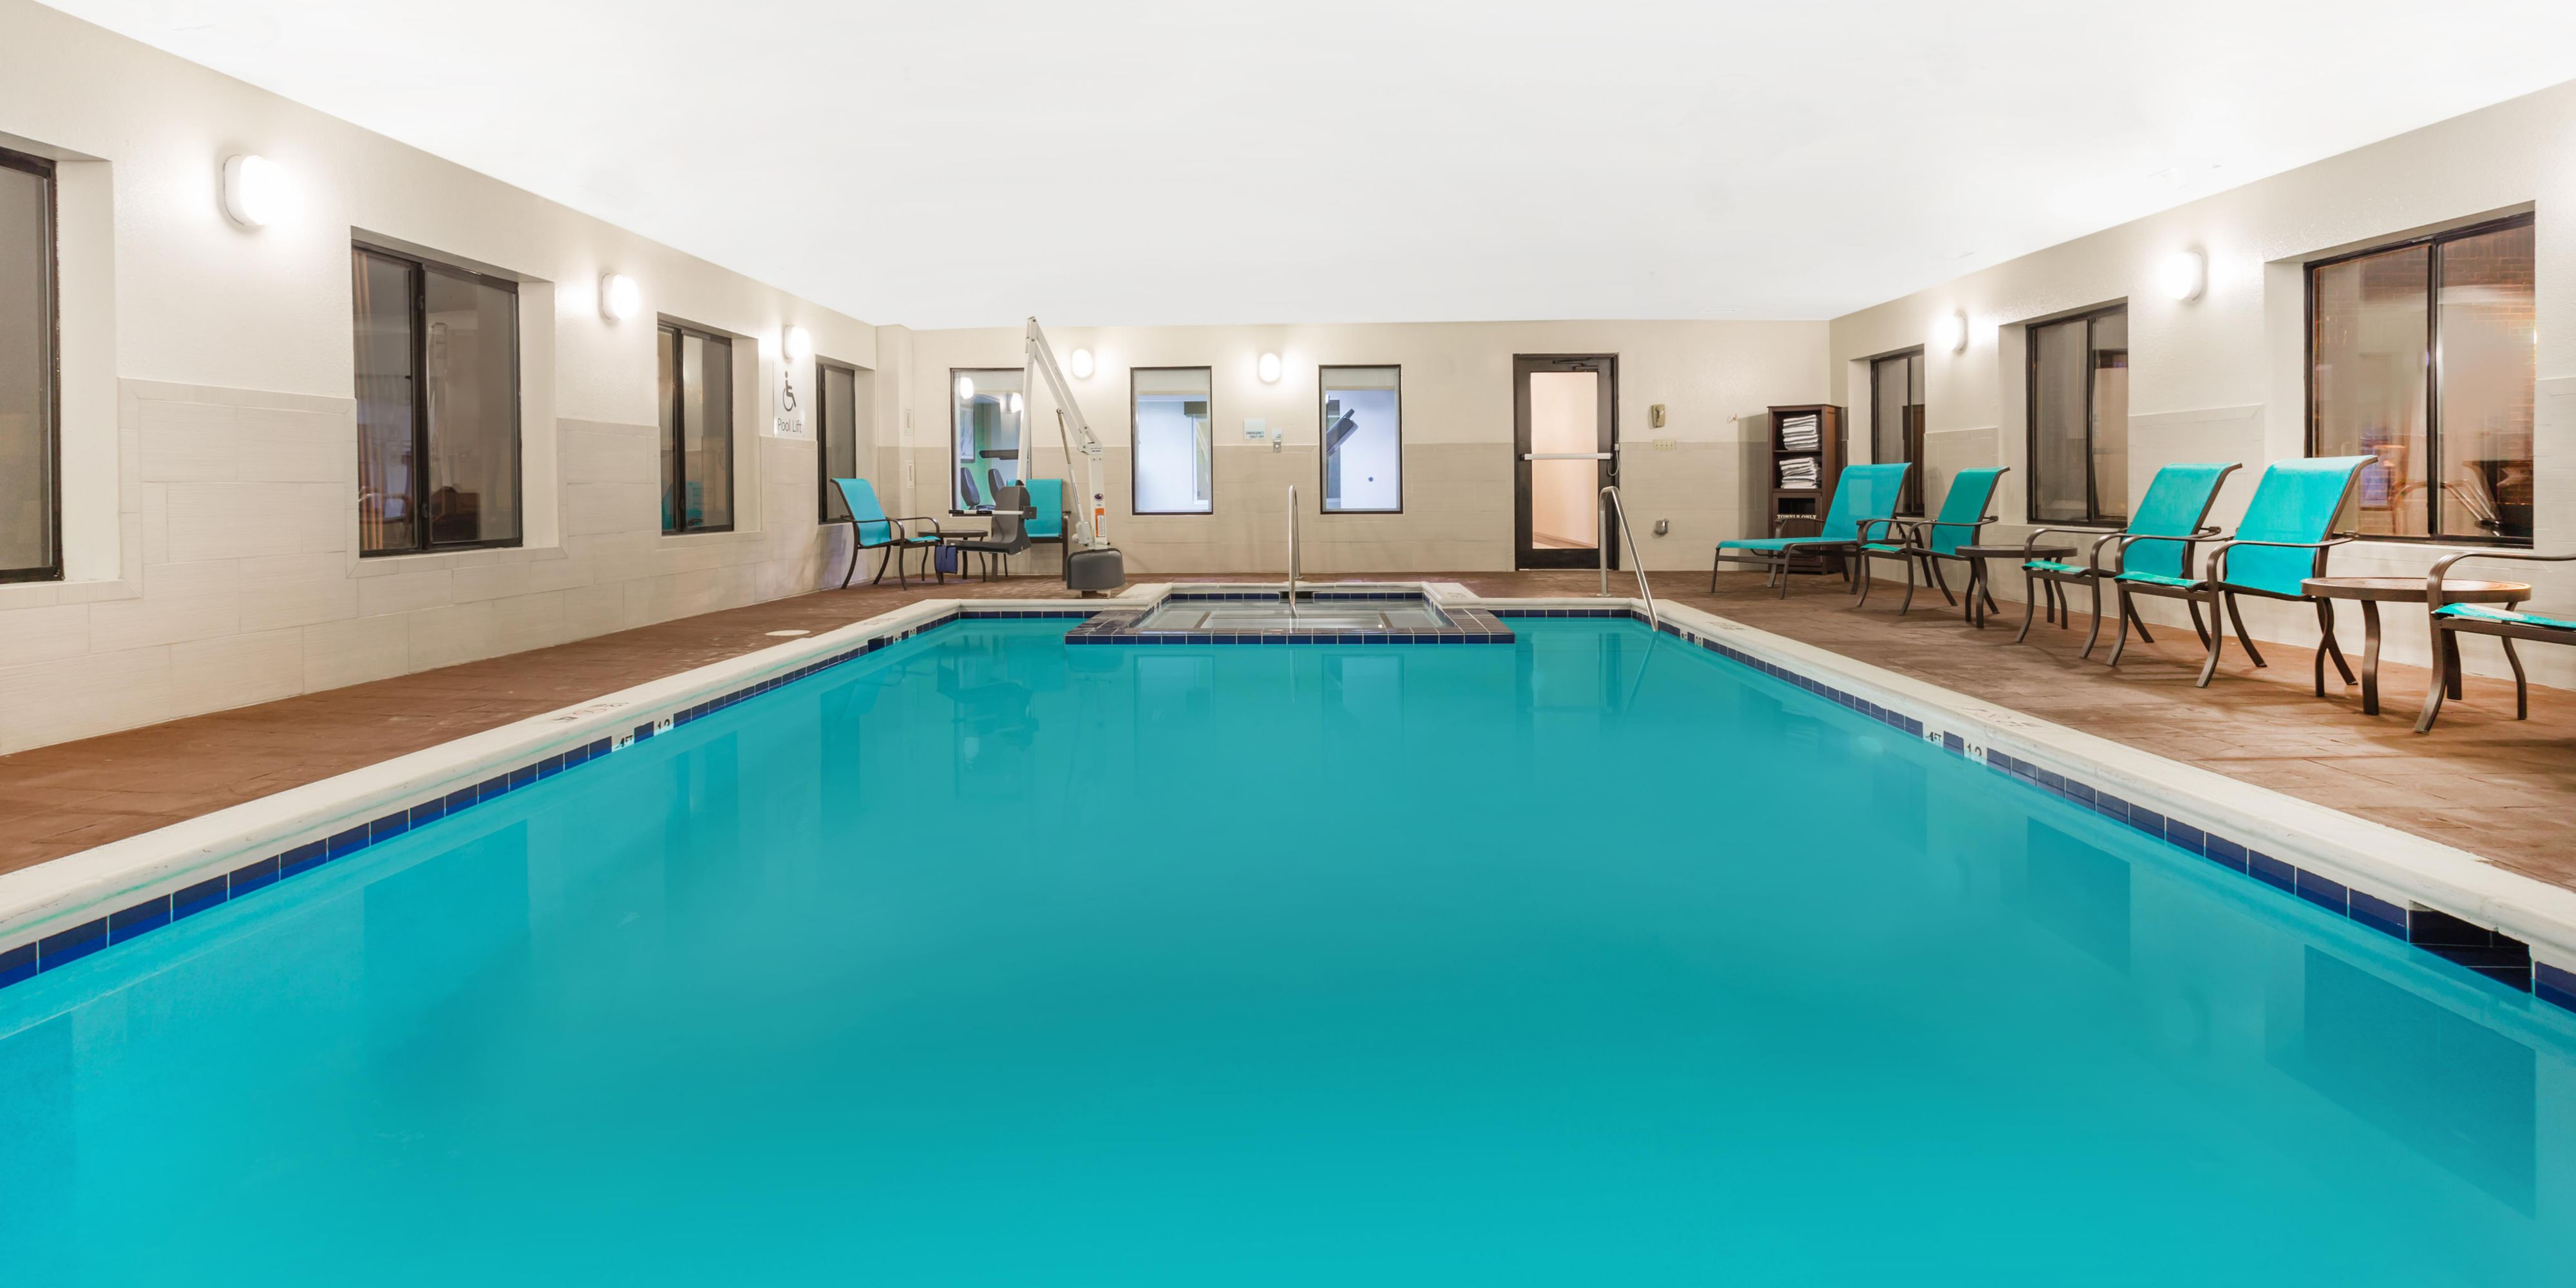 Holiday Inn Express Princeton 4875839525 2x1